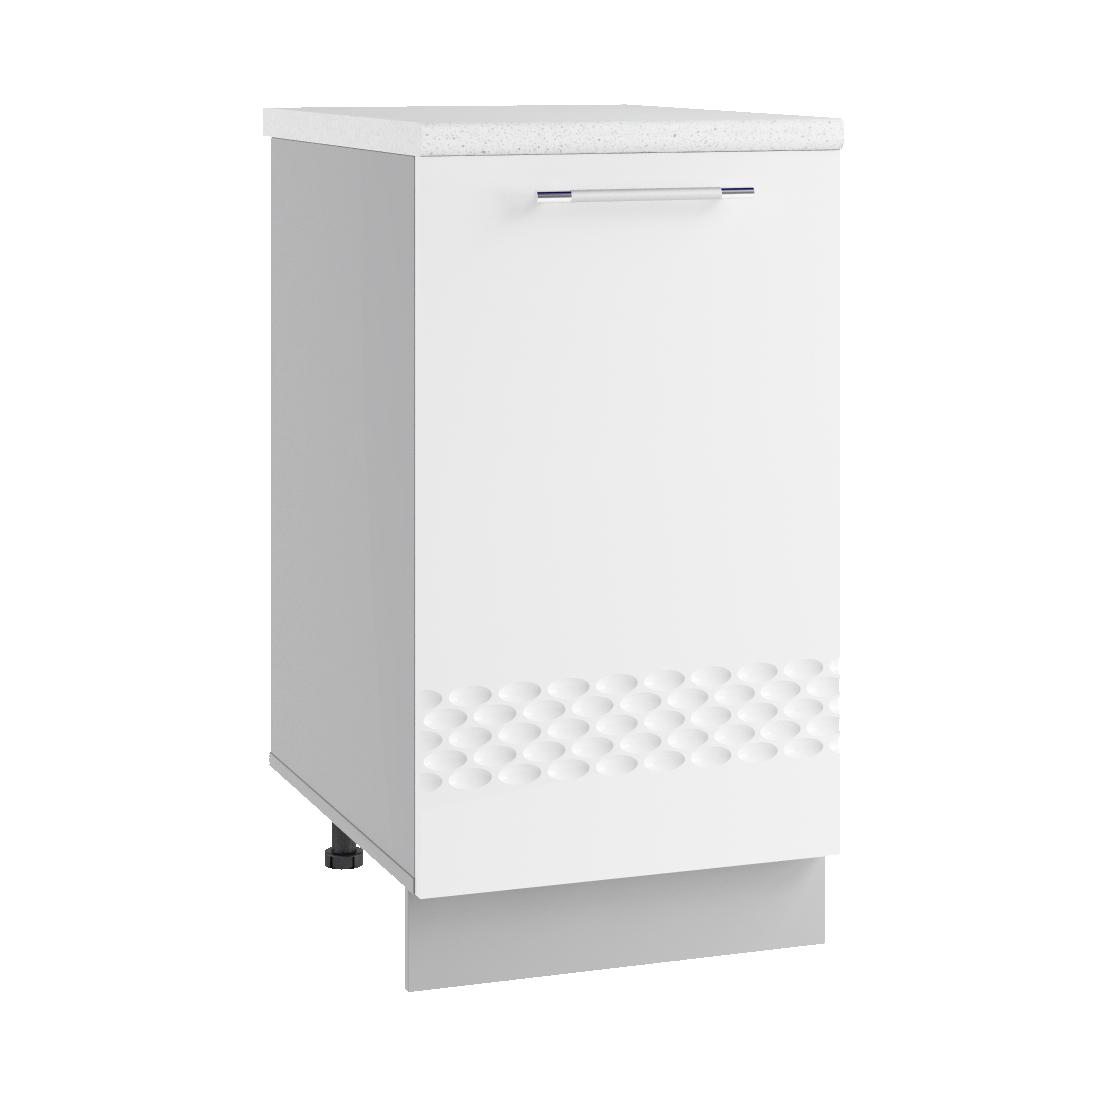 Кухня Капля 3D С 450 Шкаф нижний петли справа